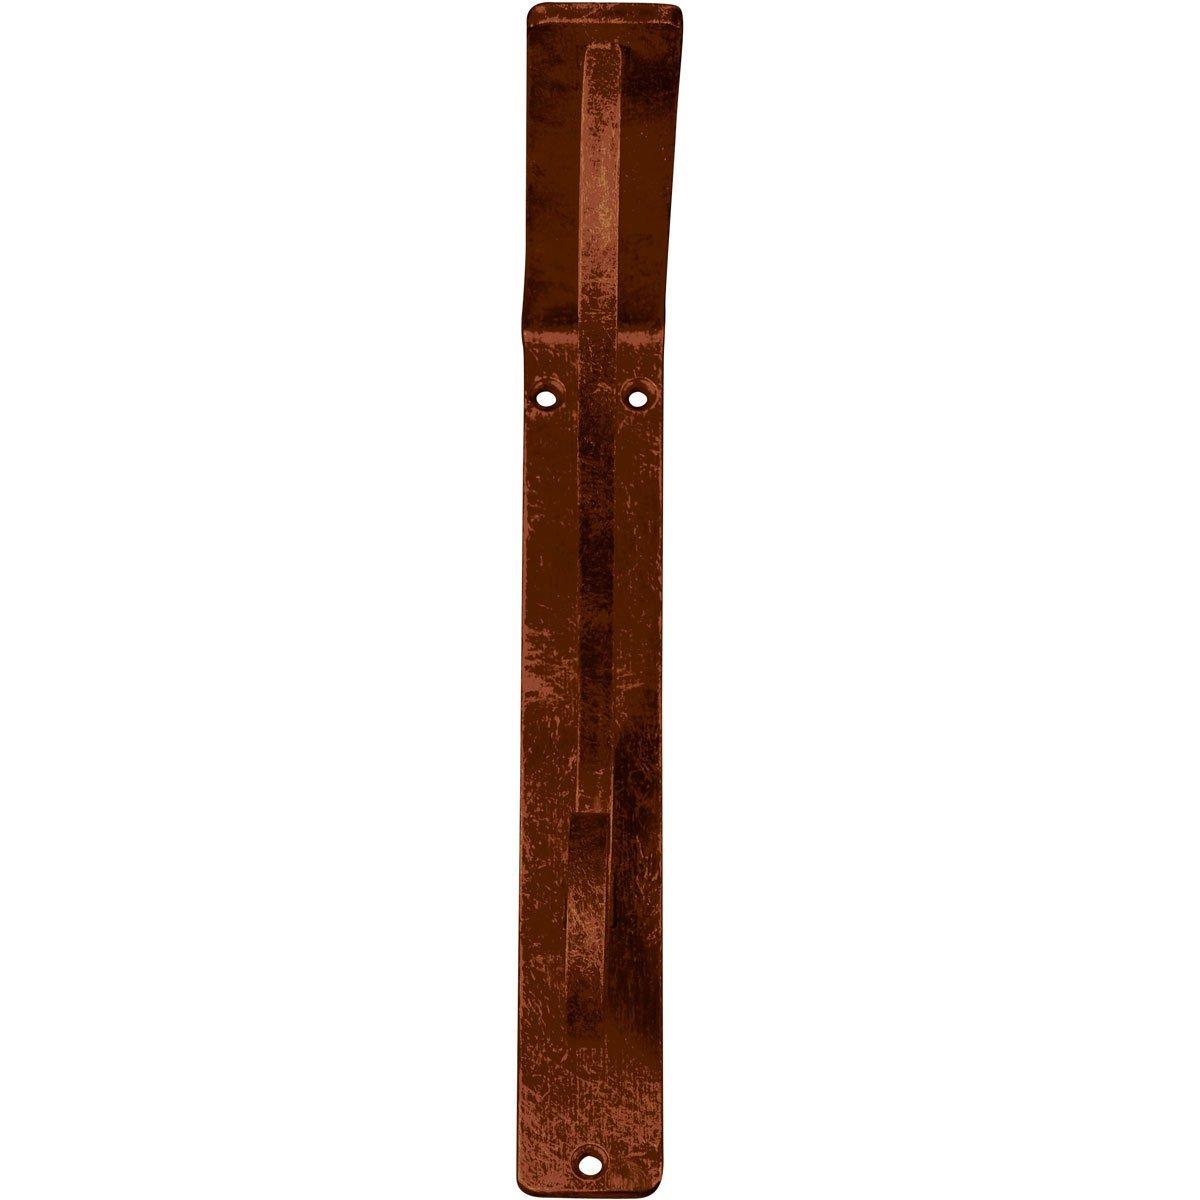 Ekena Millwork BKTM02X12X15TAS  2-Inch W x 12-Inch D x 15-Inch H Ashford Triple Wrought Iron Bracket